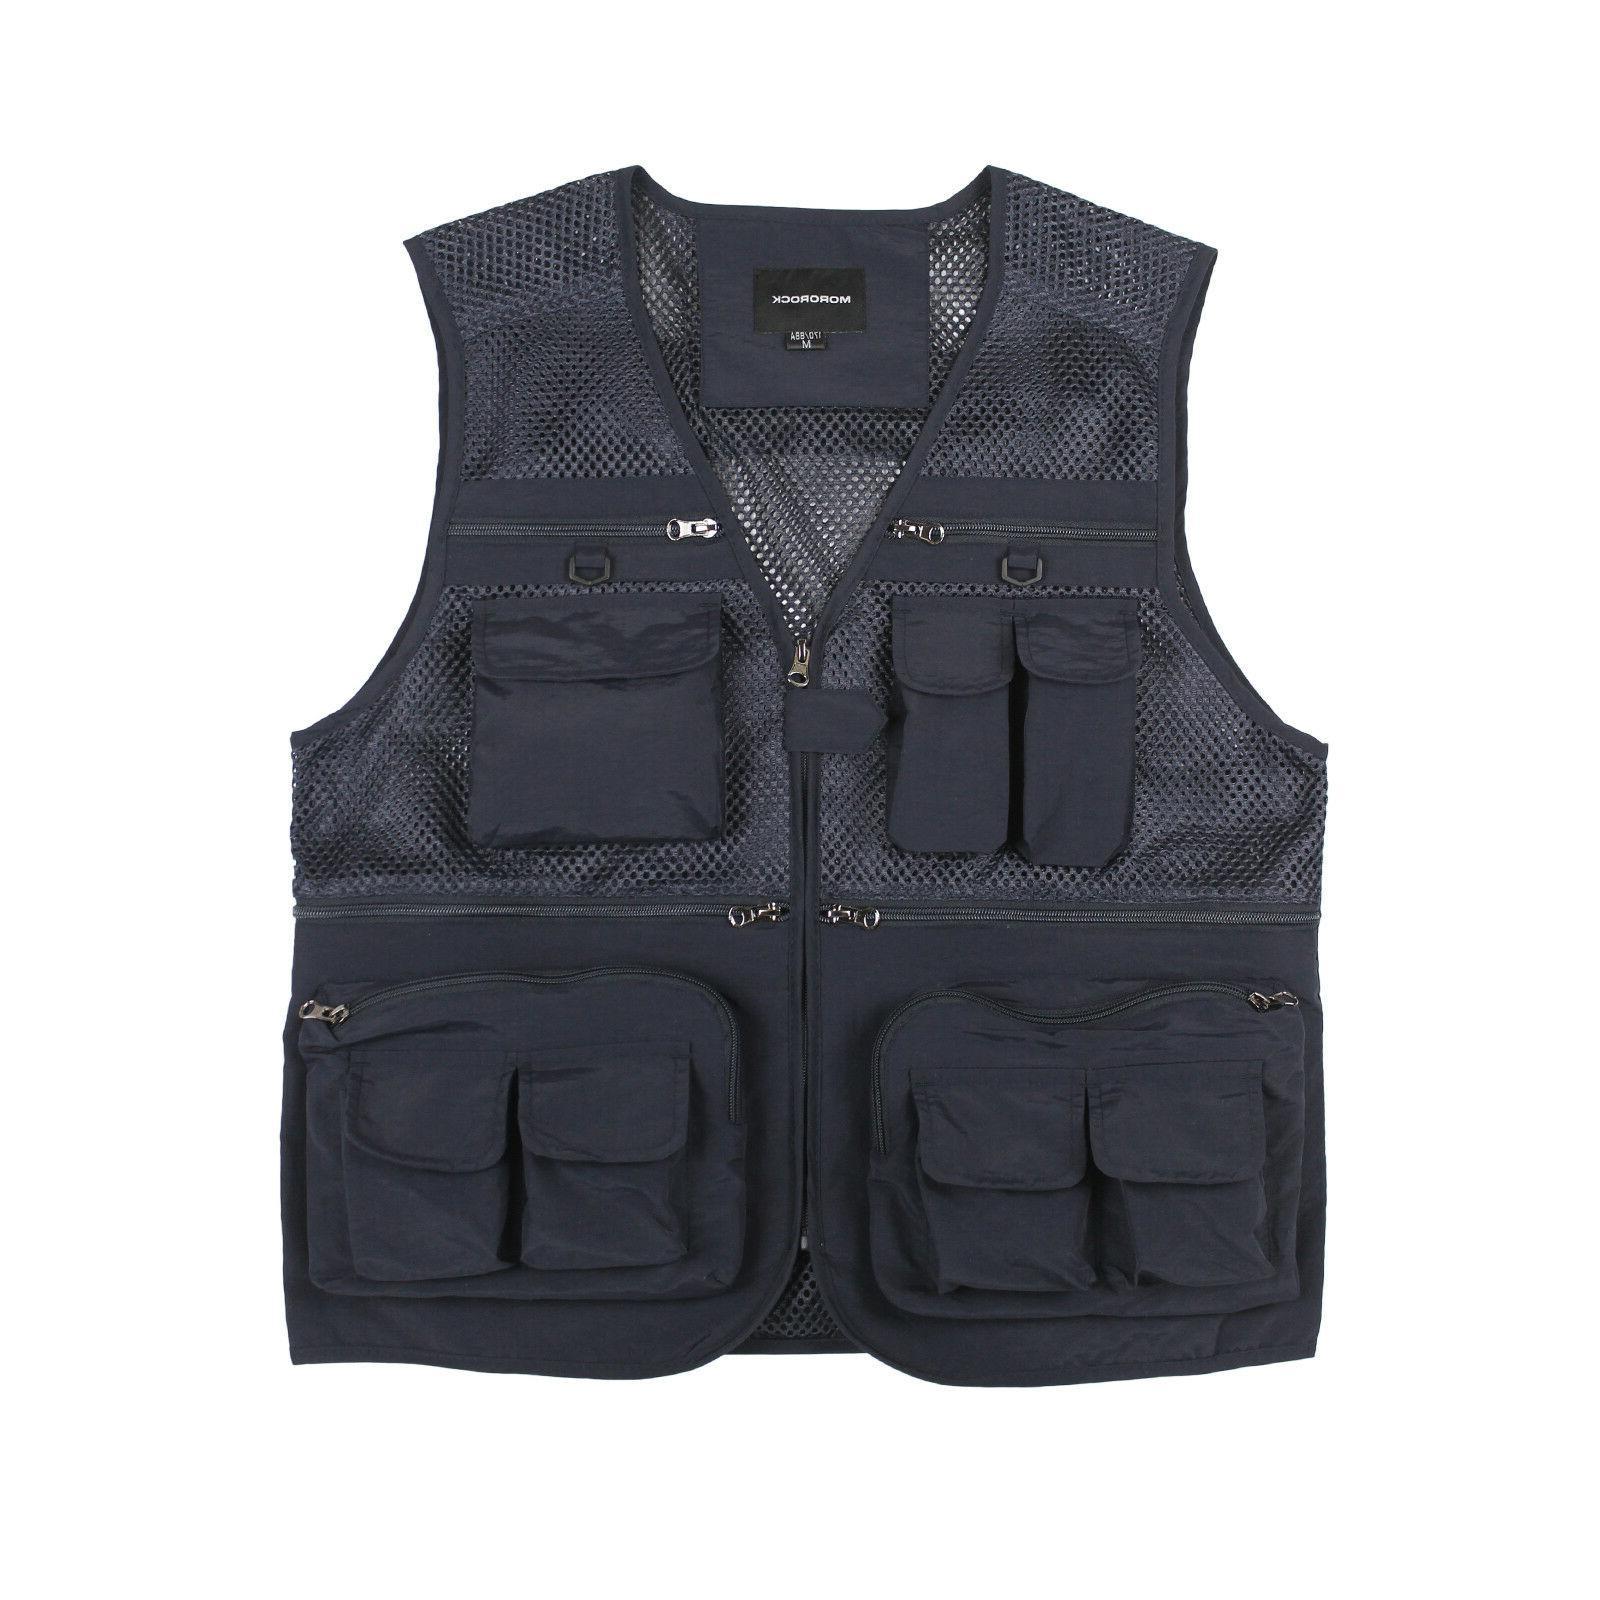 Mororock Fishing Vest Mesh 16 Pockets Photography Dry Waistcoat Jacket